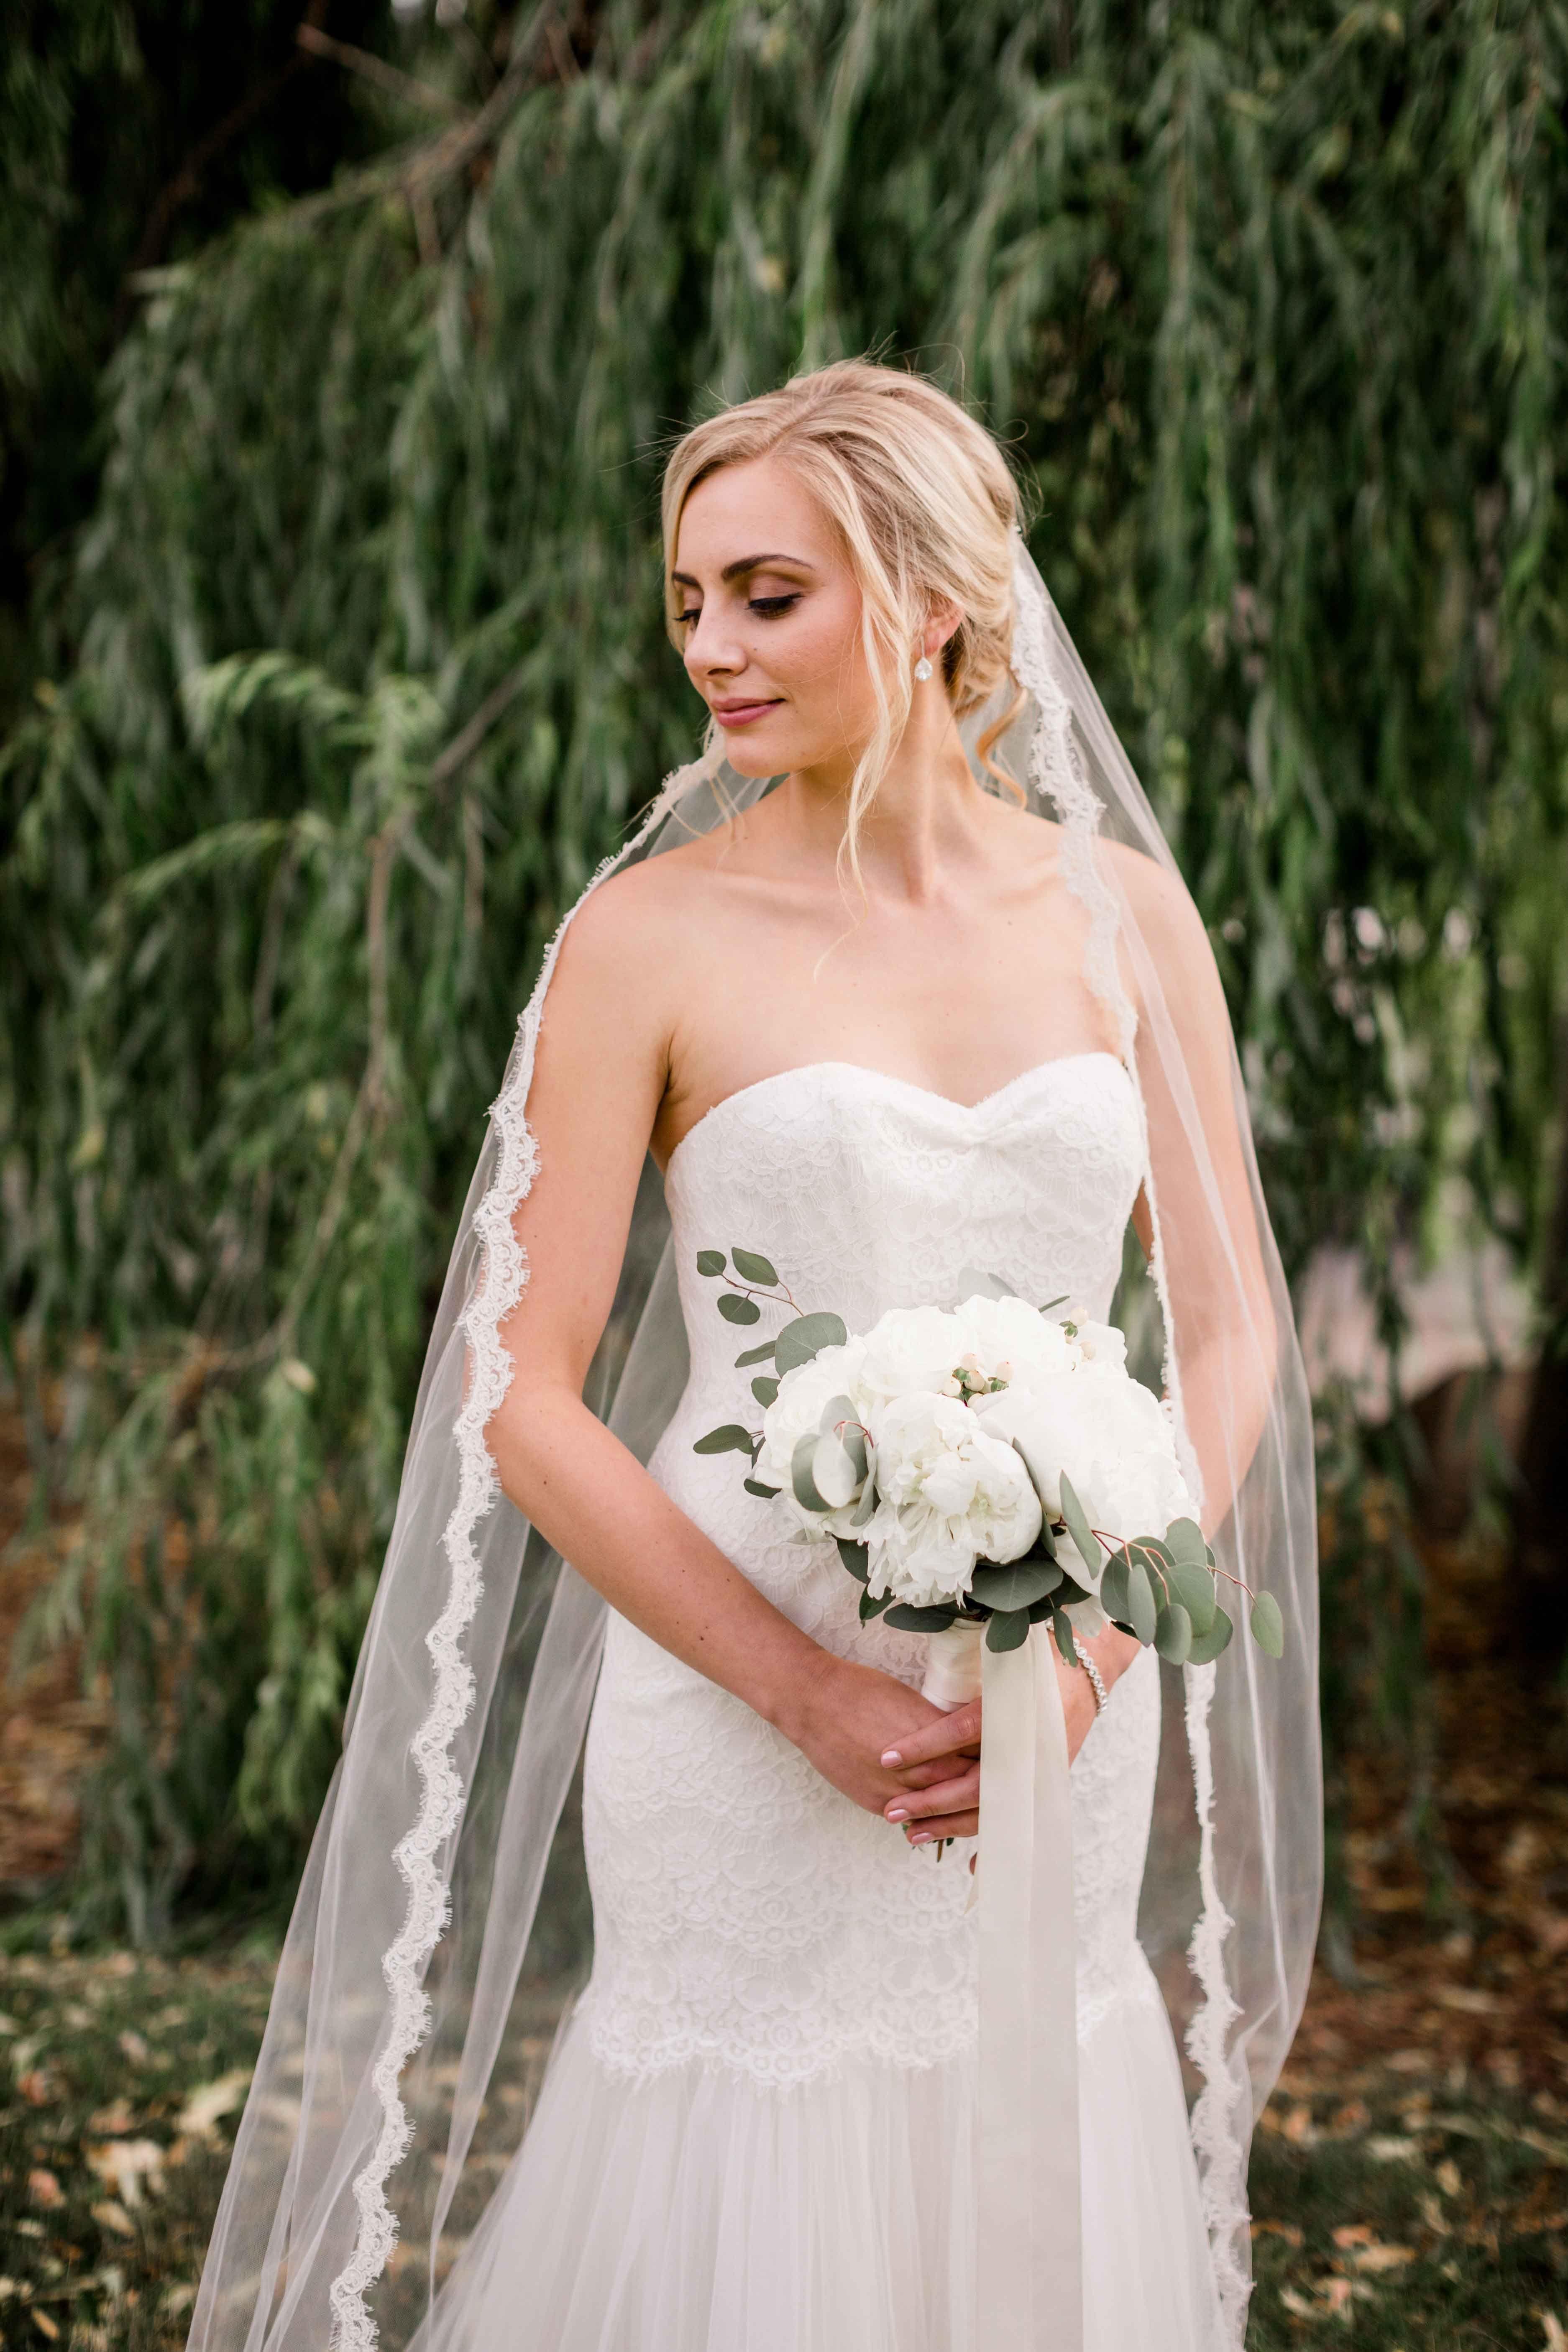 Simple + Rustic Park Wedding with DIY Details in Portland, Oregon ...